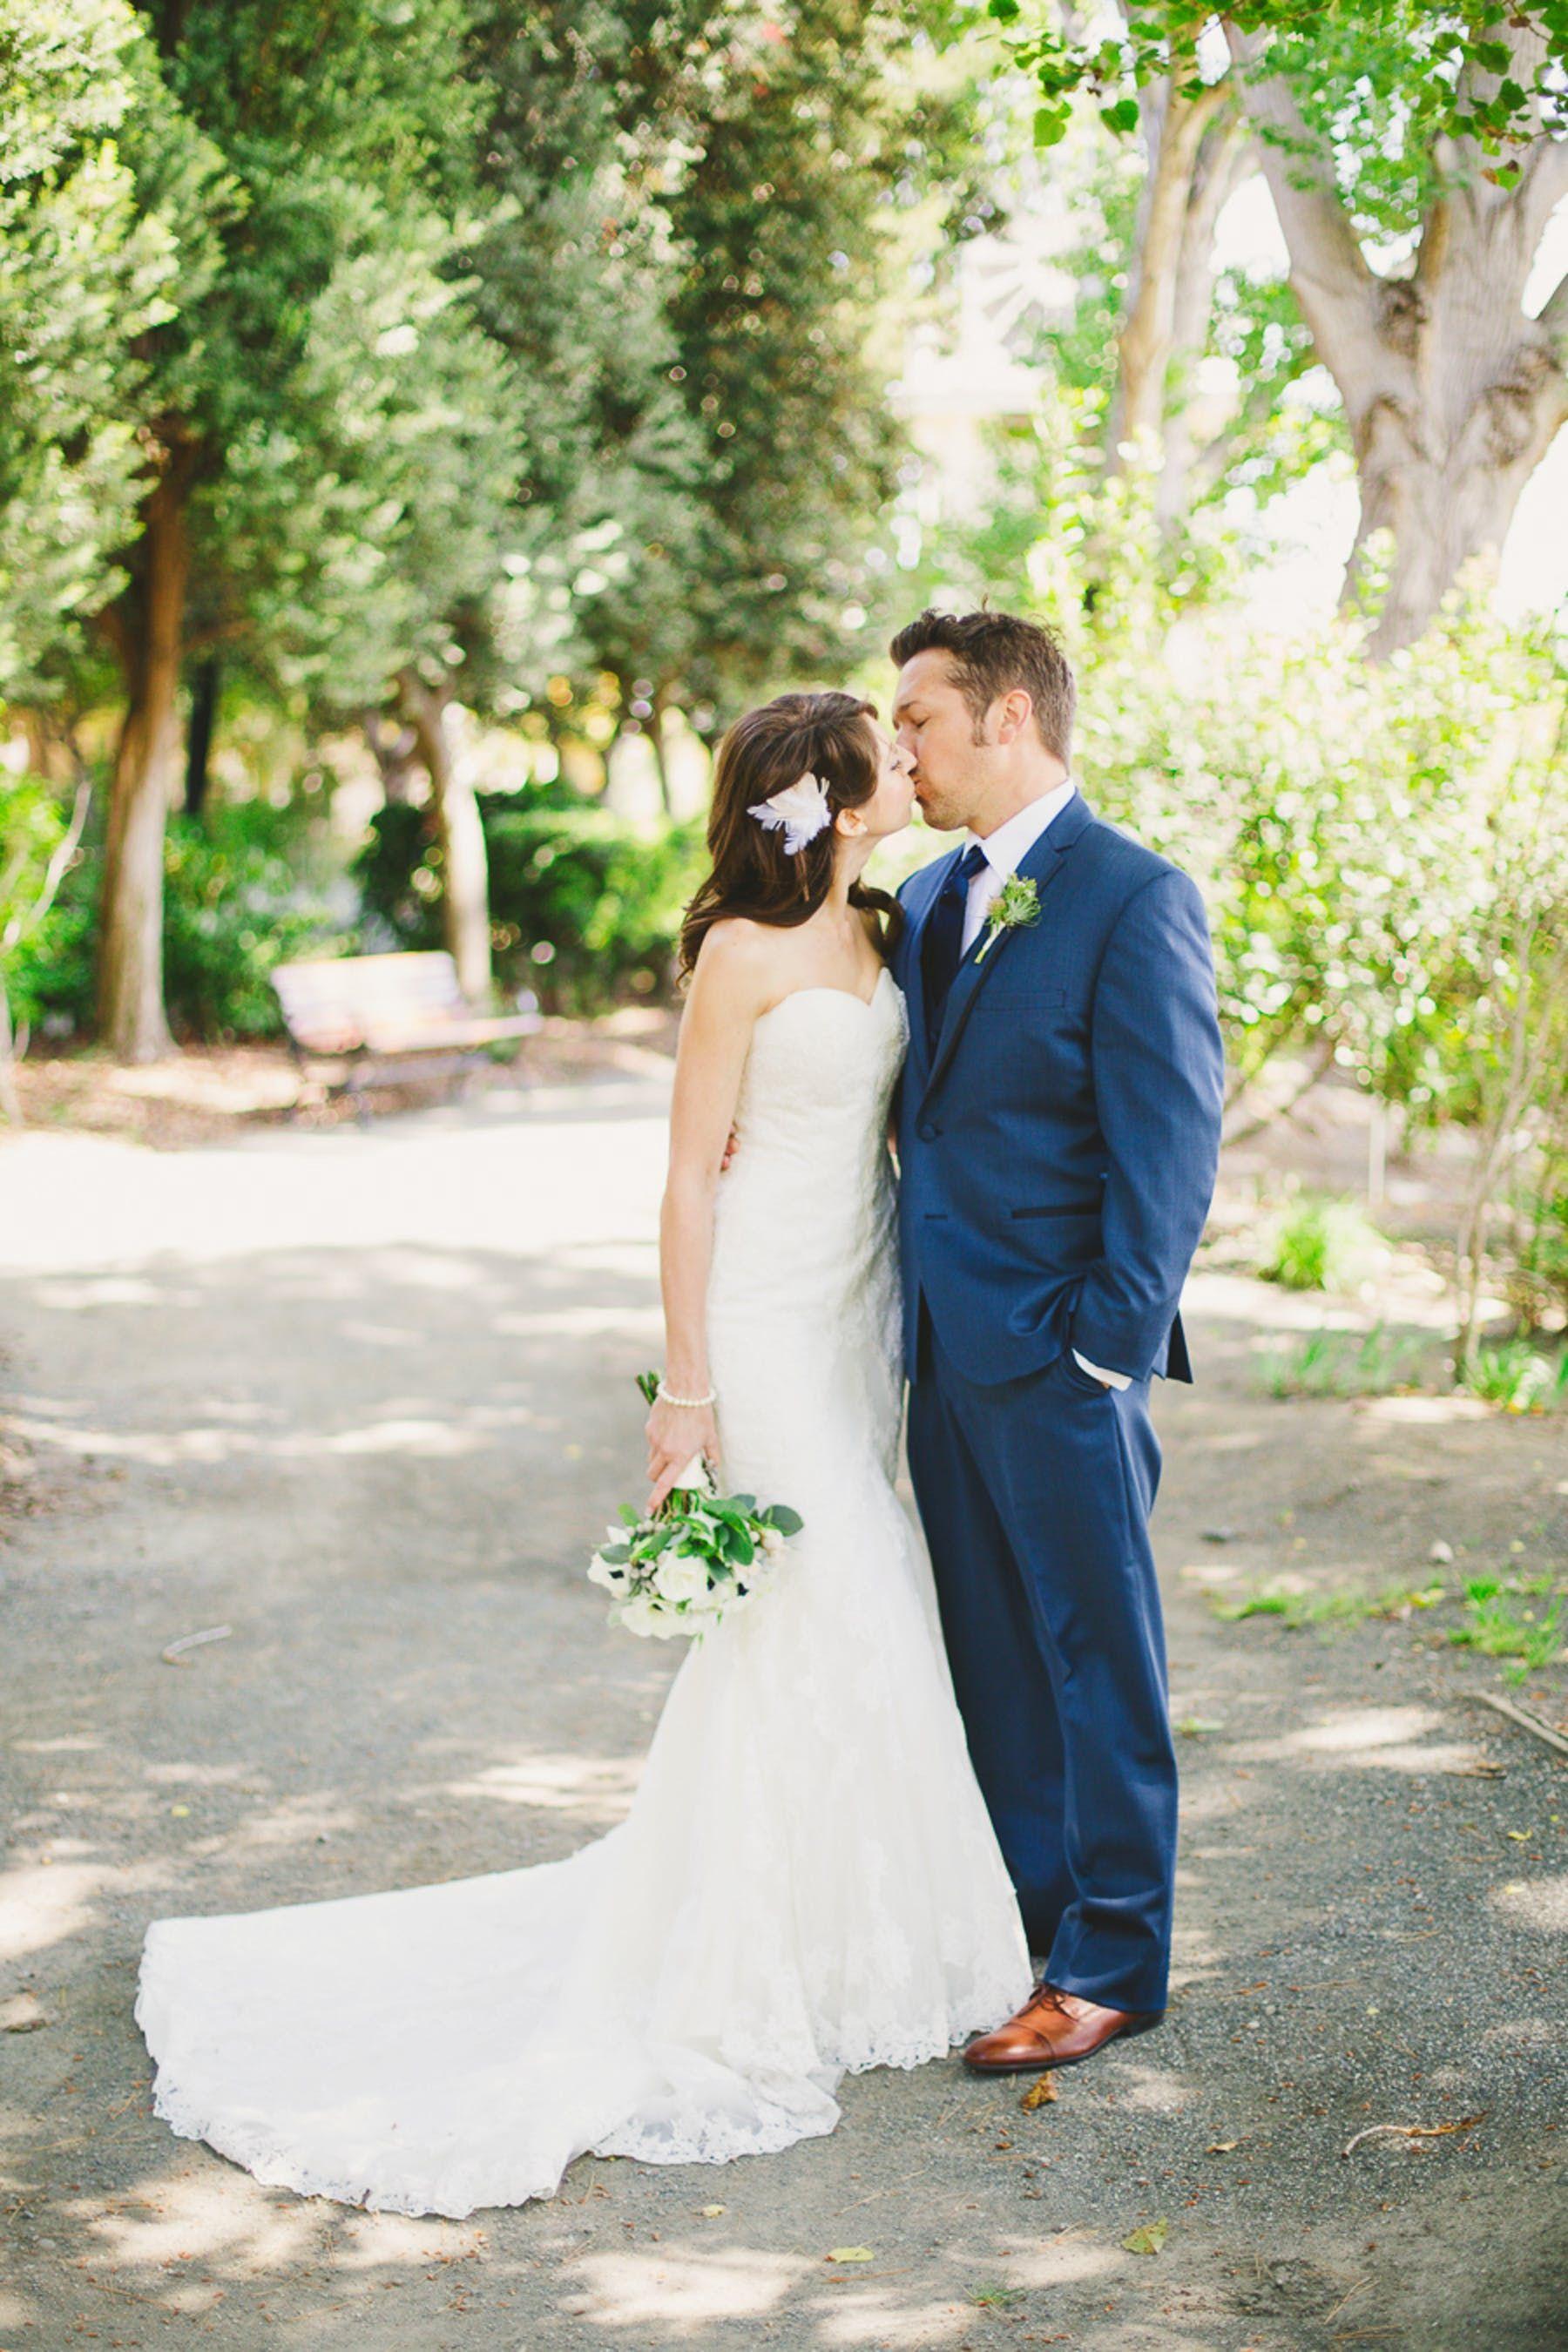 Intimate Rustic Garden Wedding at Rengstorff House is part of garden Wedding Attire - Intimate Rustic Garden Wedding at Rengstorff House